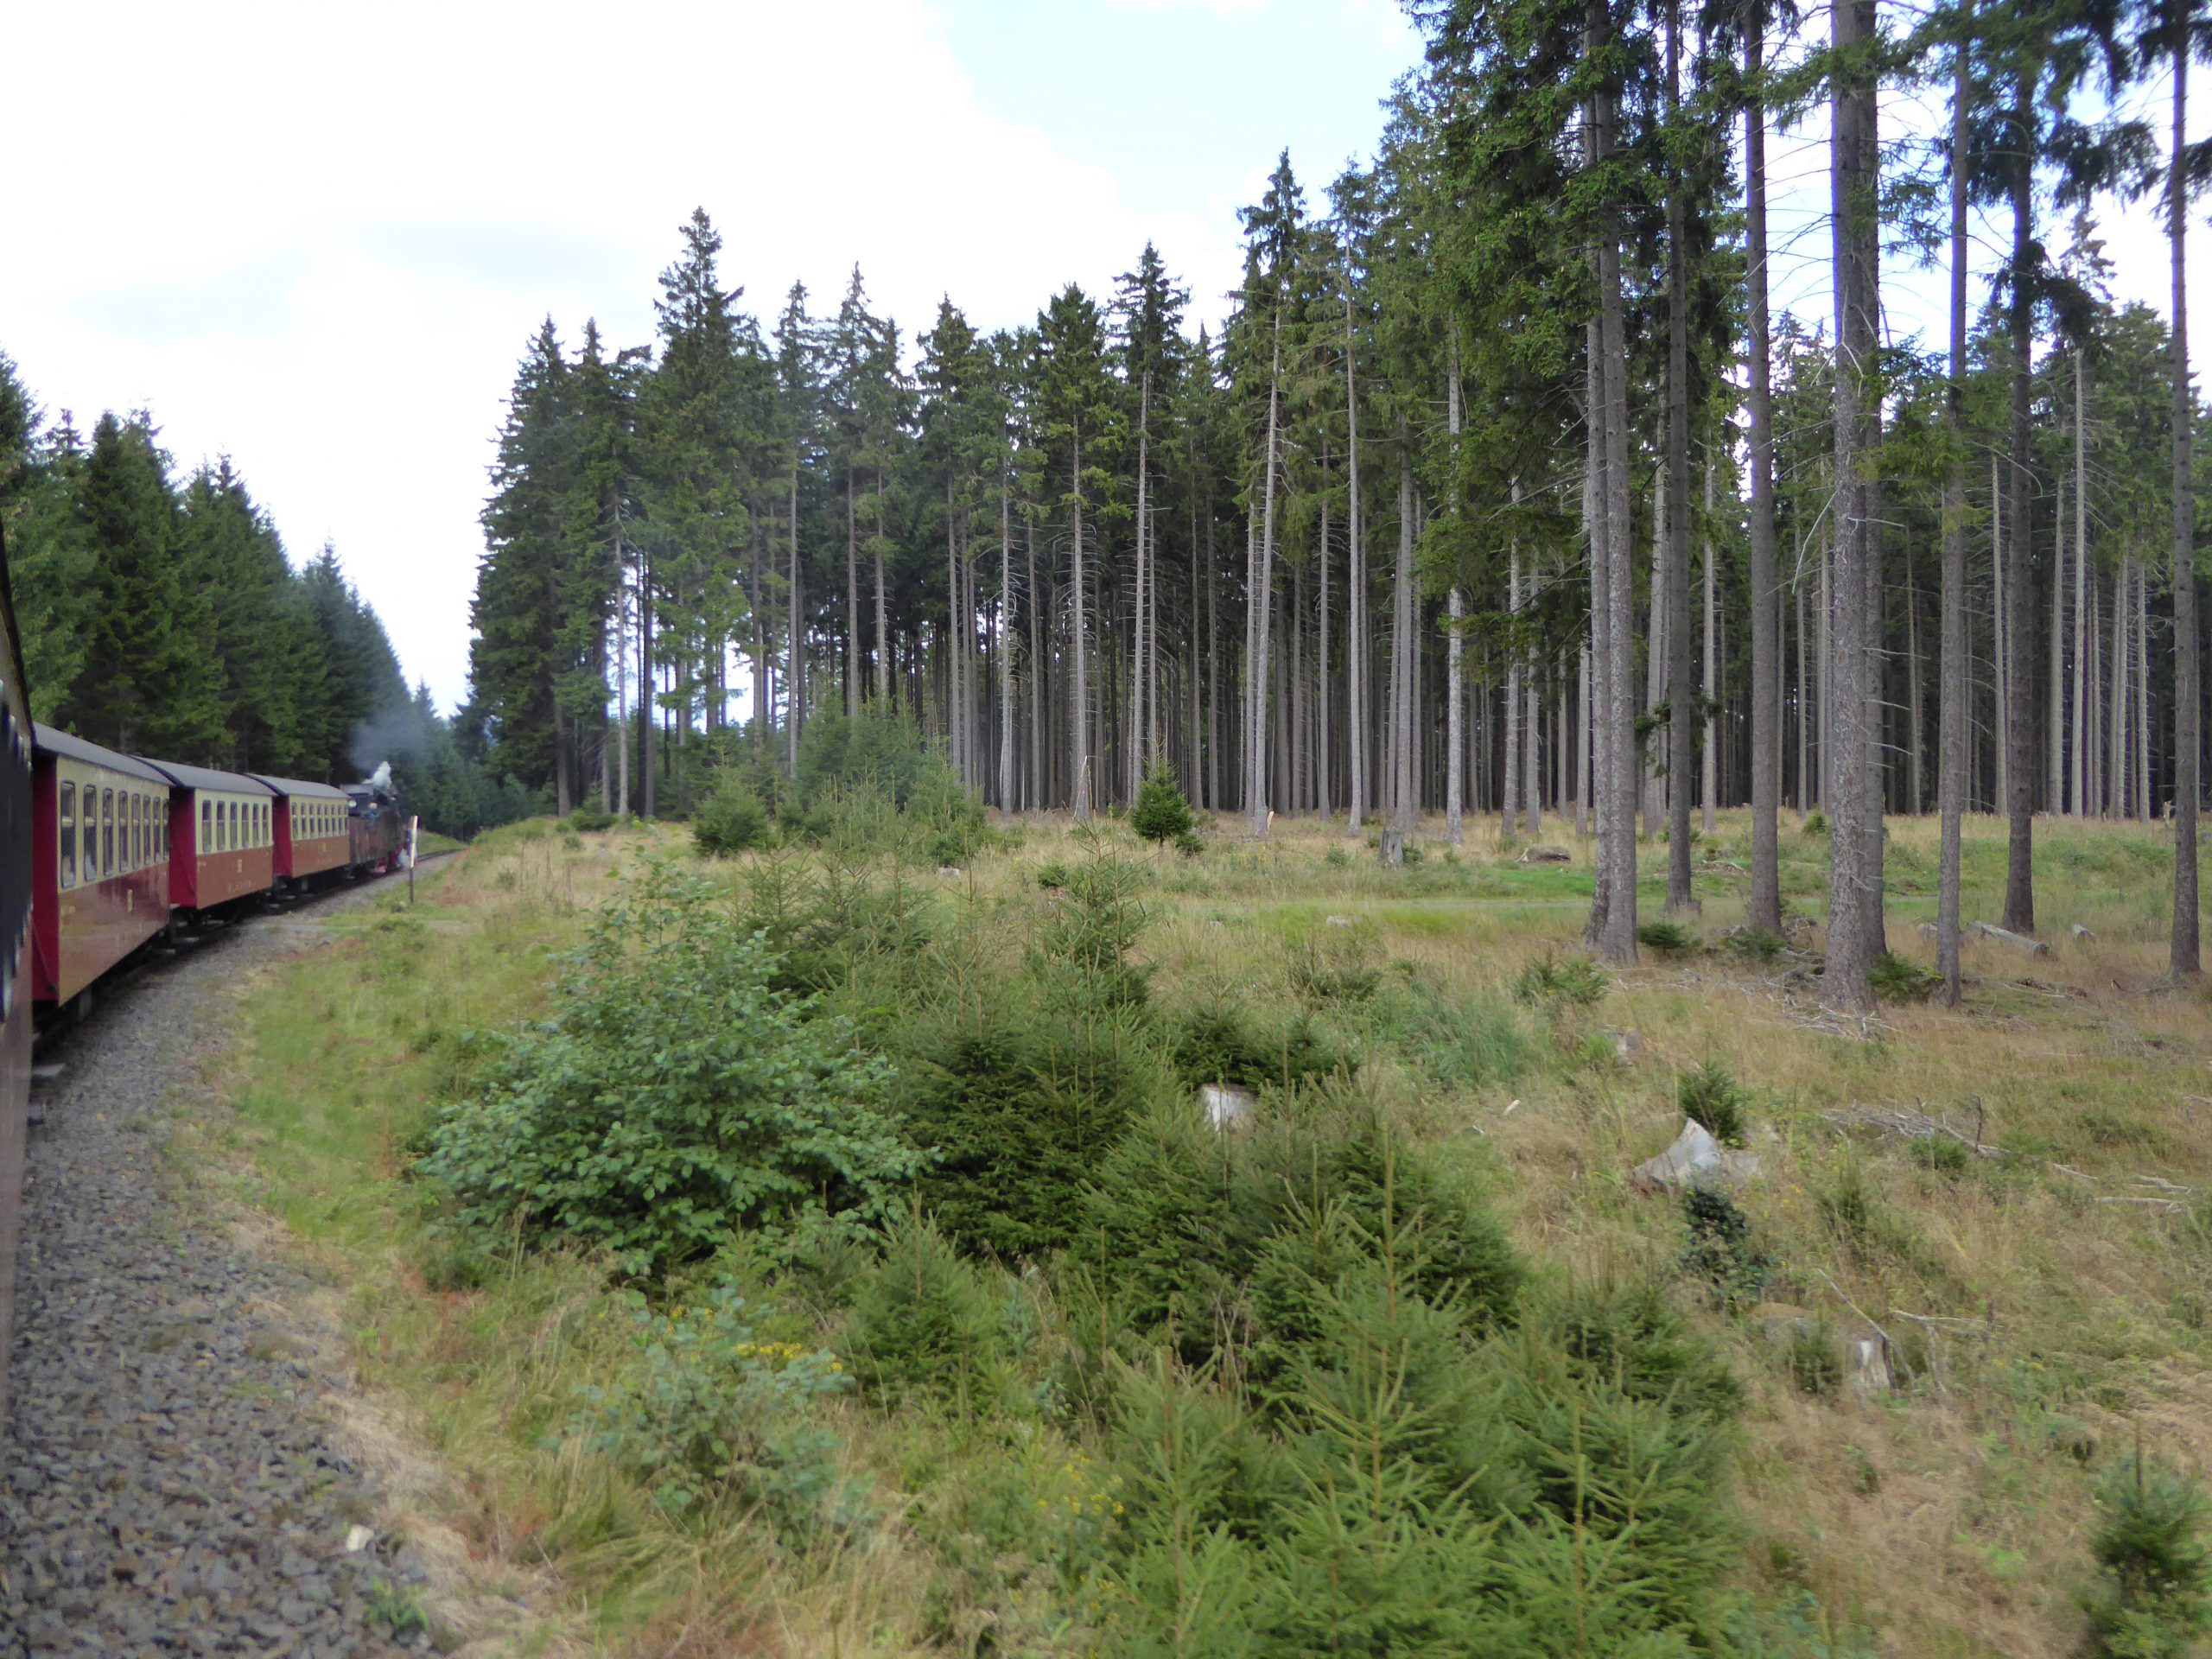 09 Harz Impr. 2